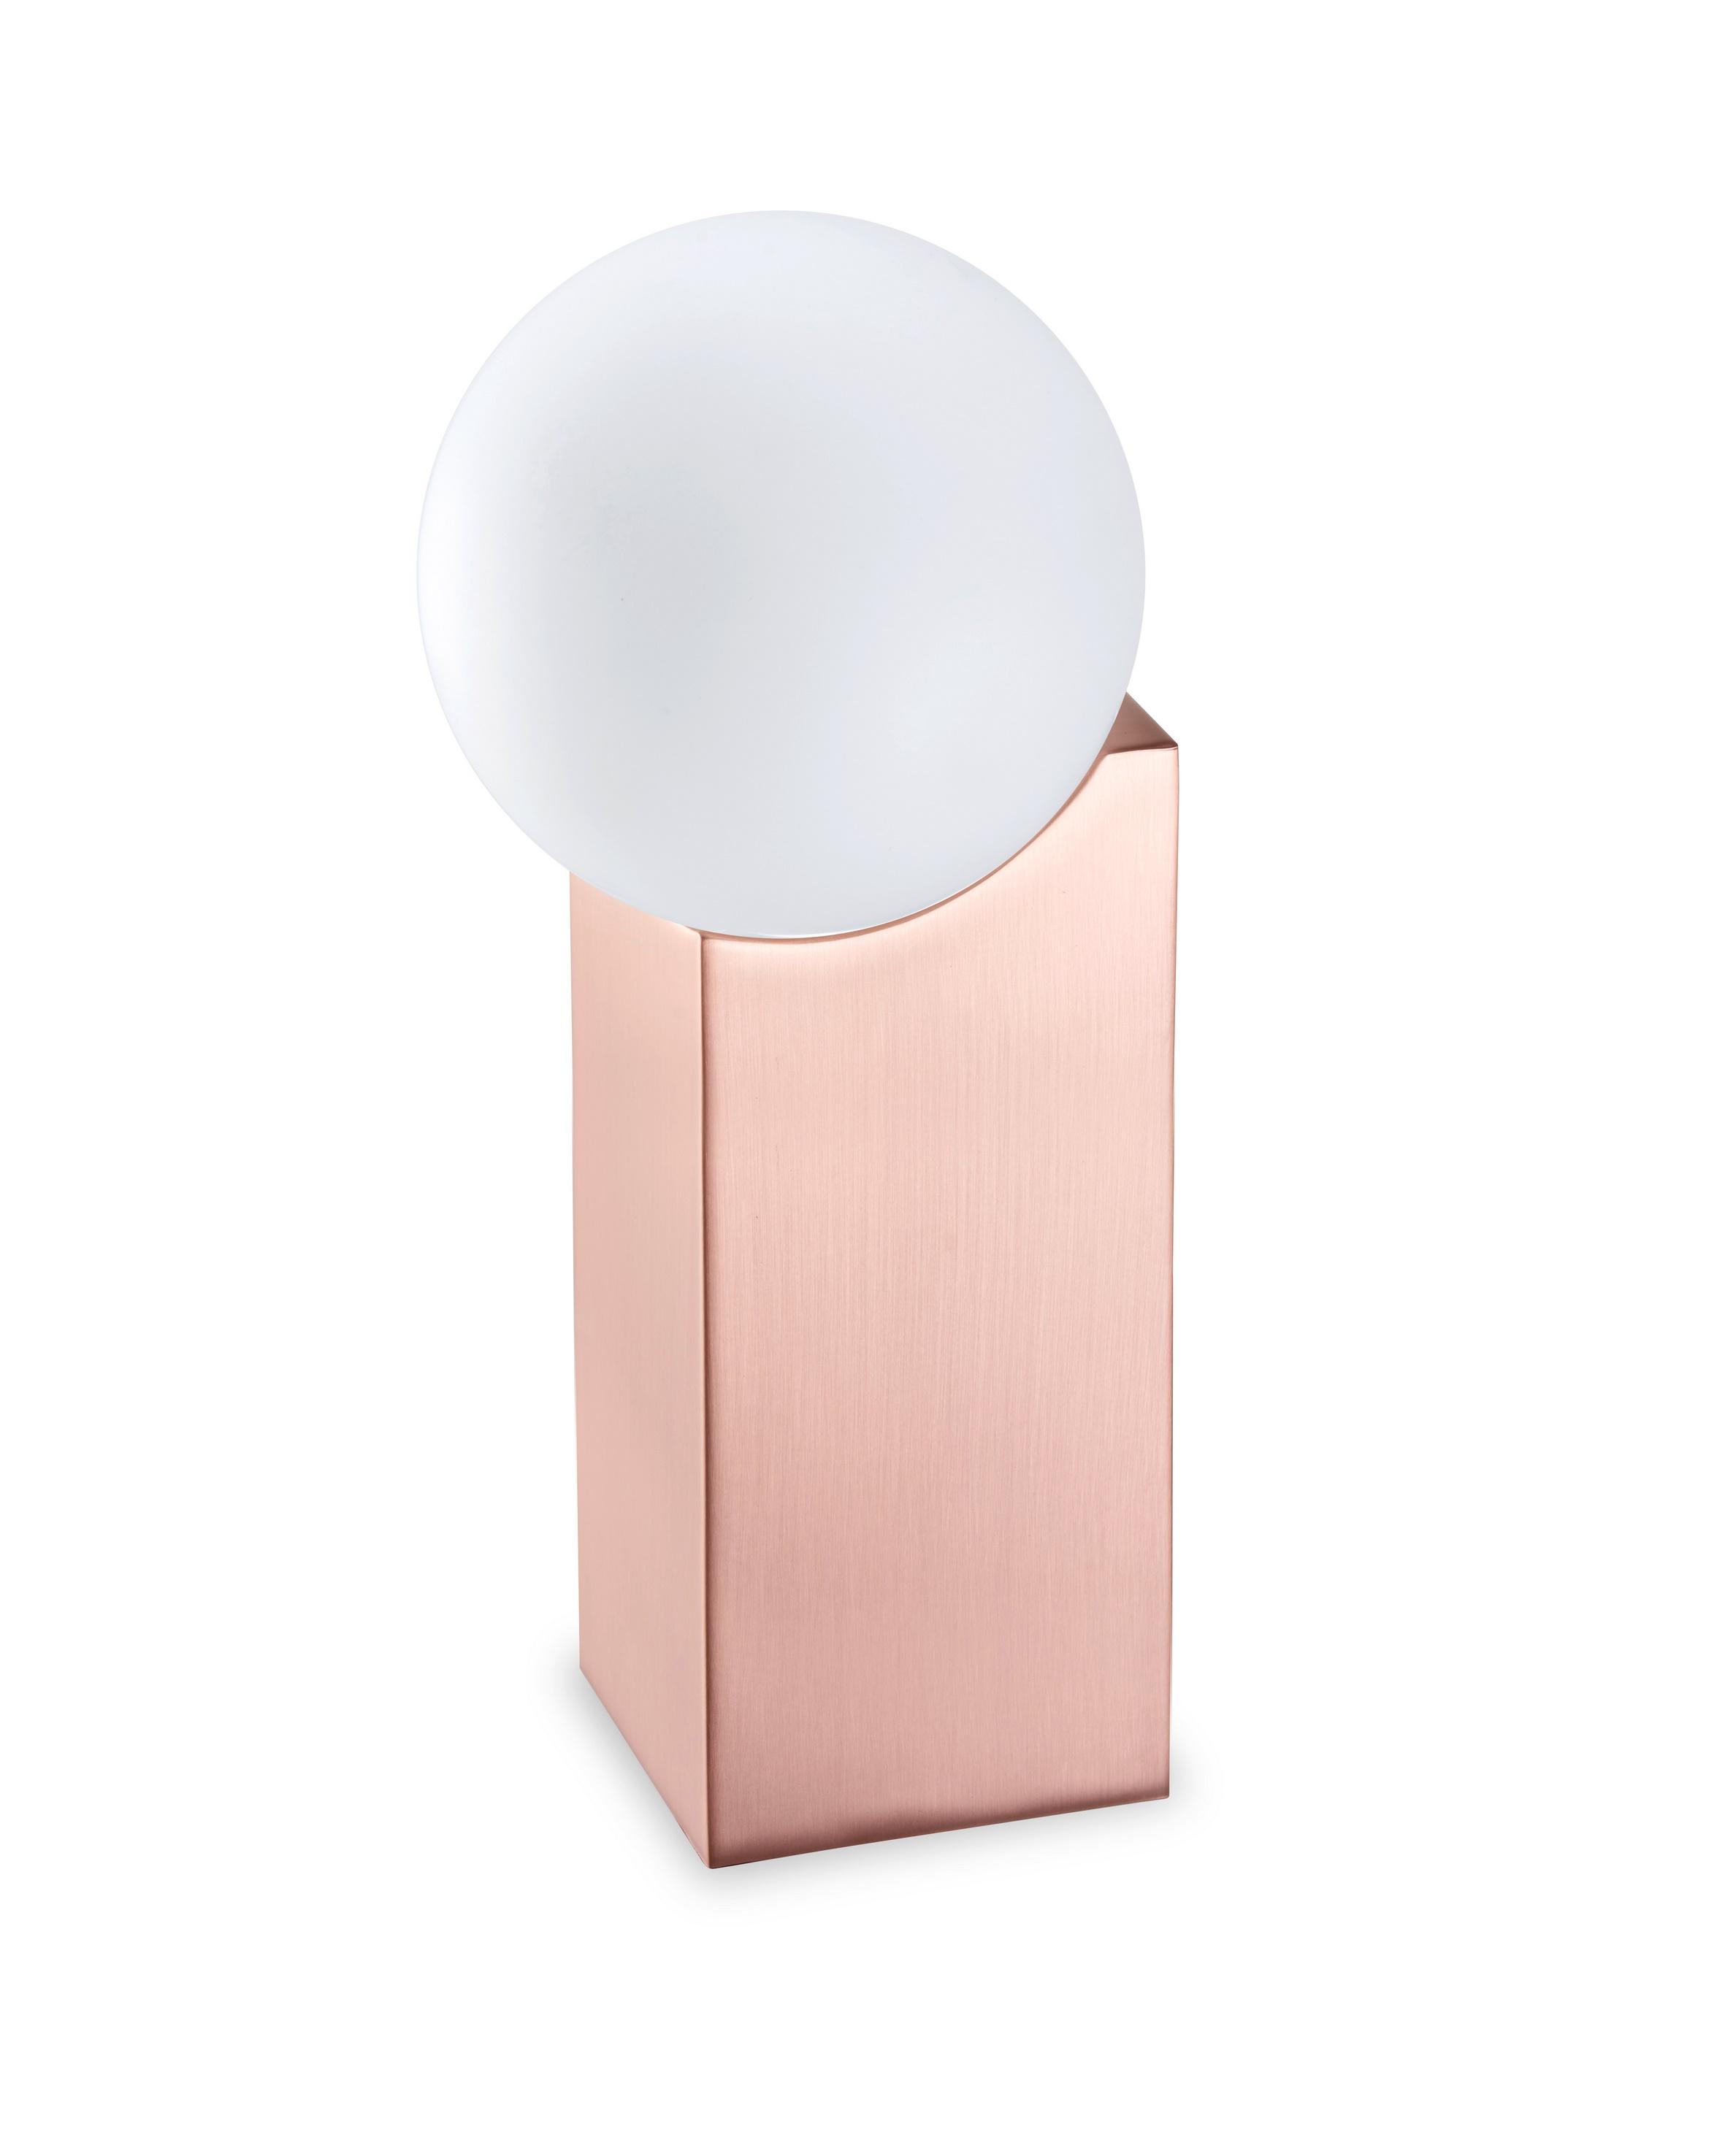 Cub Sobremesa grande G-9 LED Acero y cristal 23,5cm Cobre Satinado